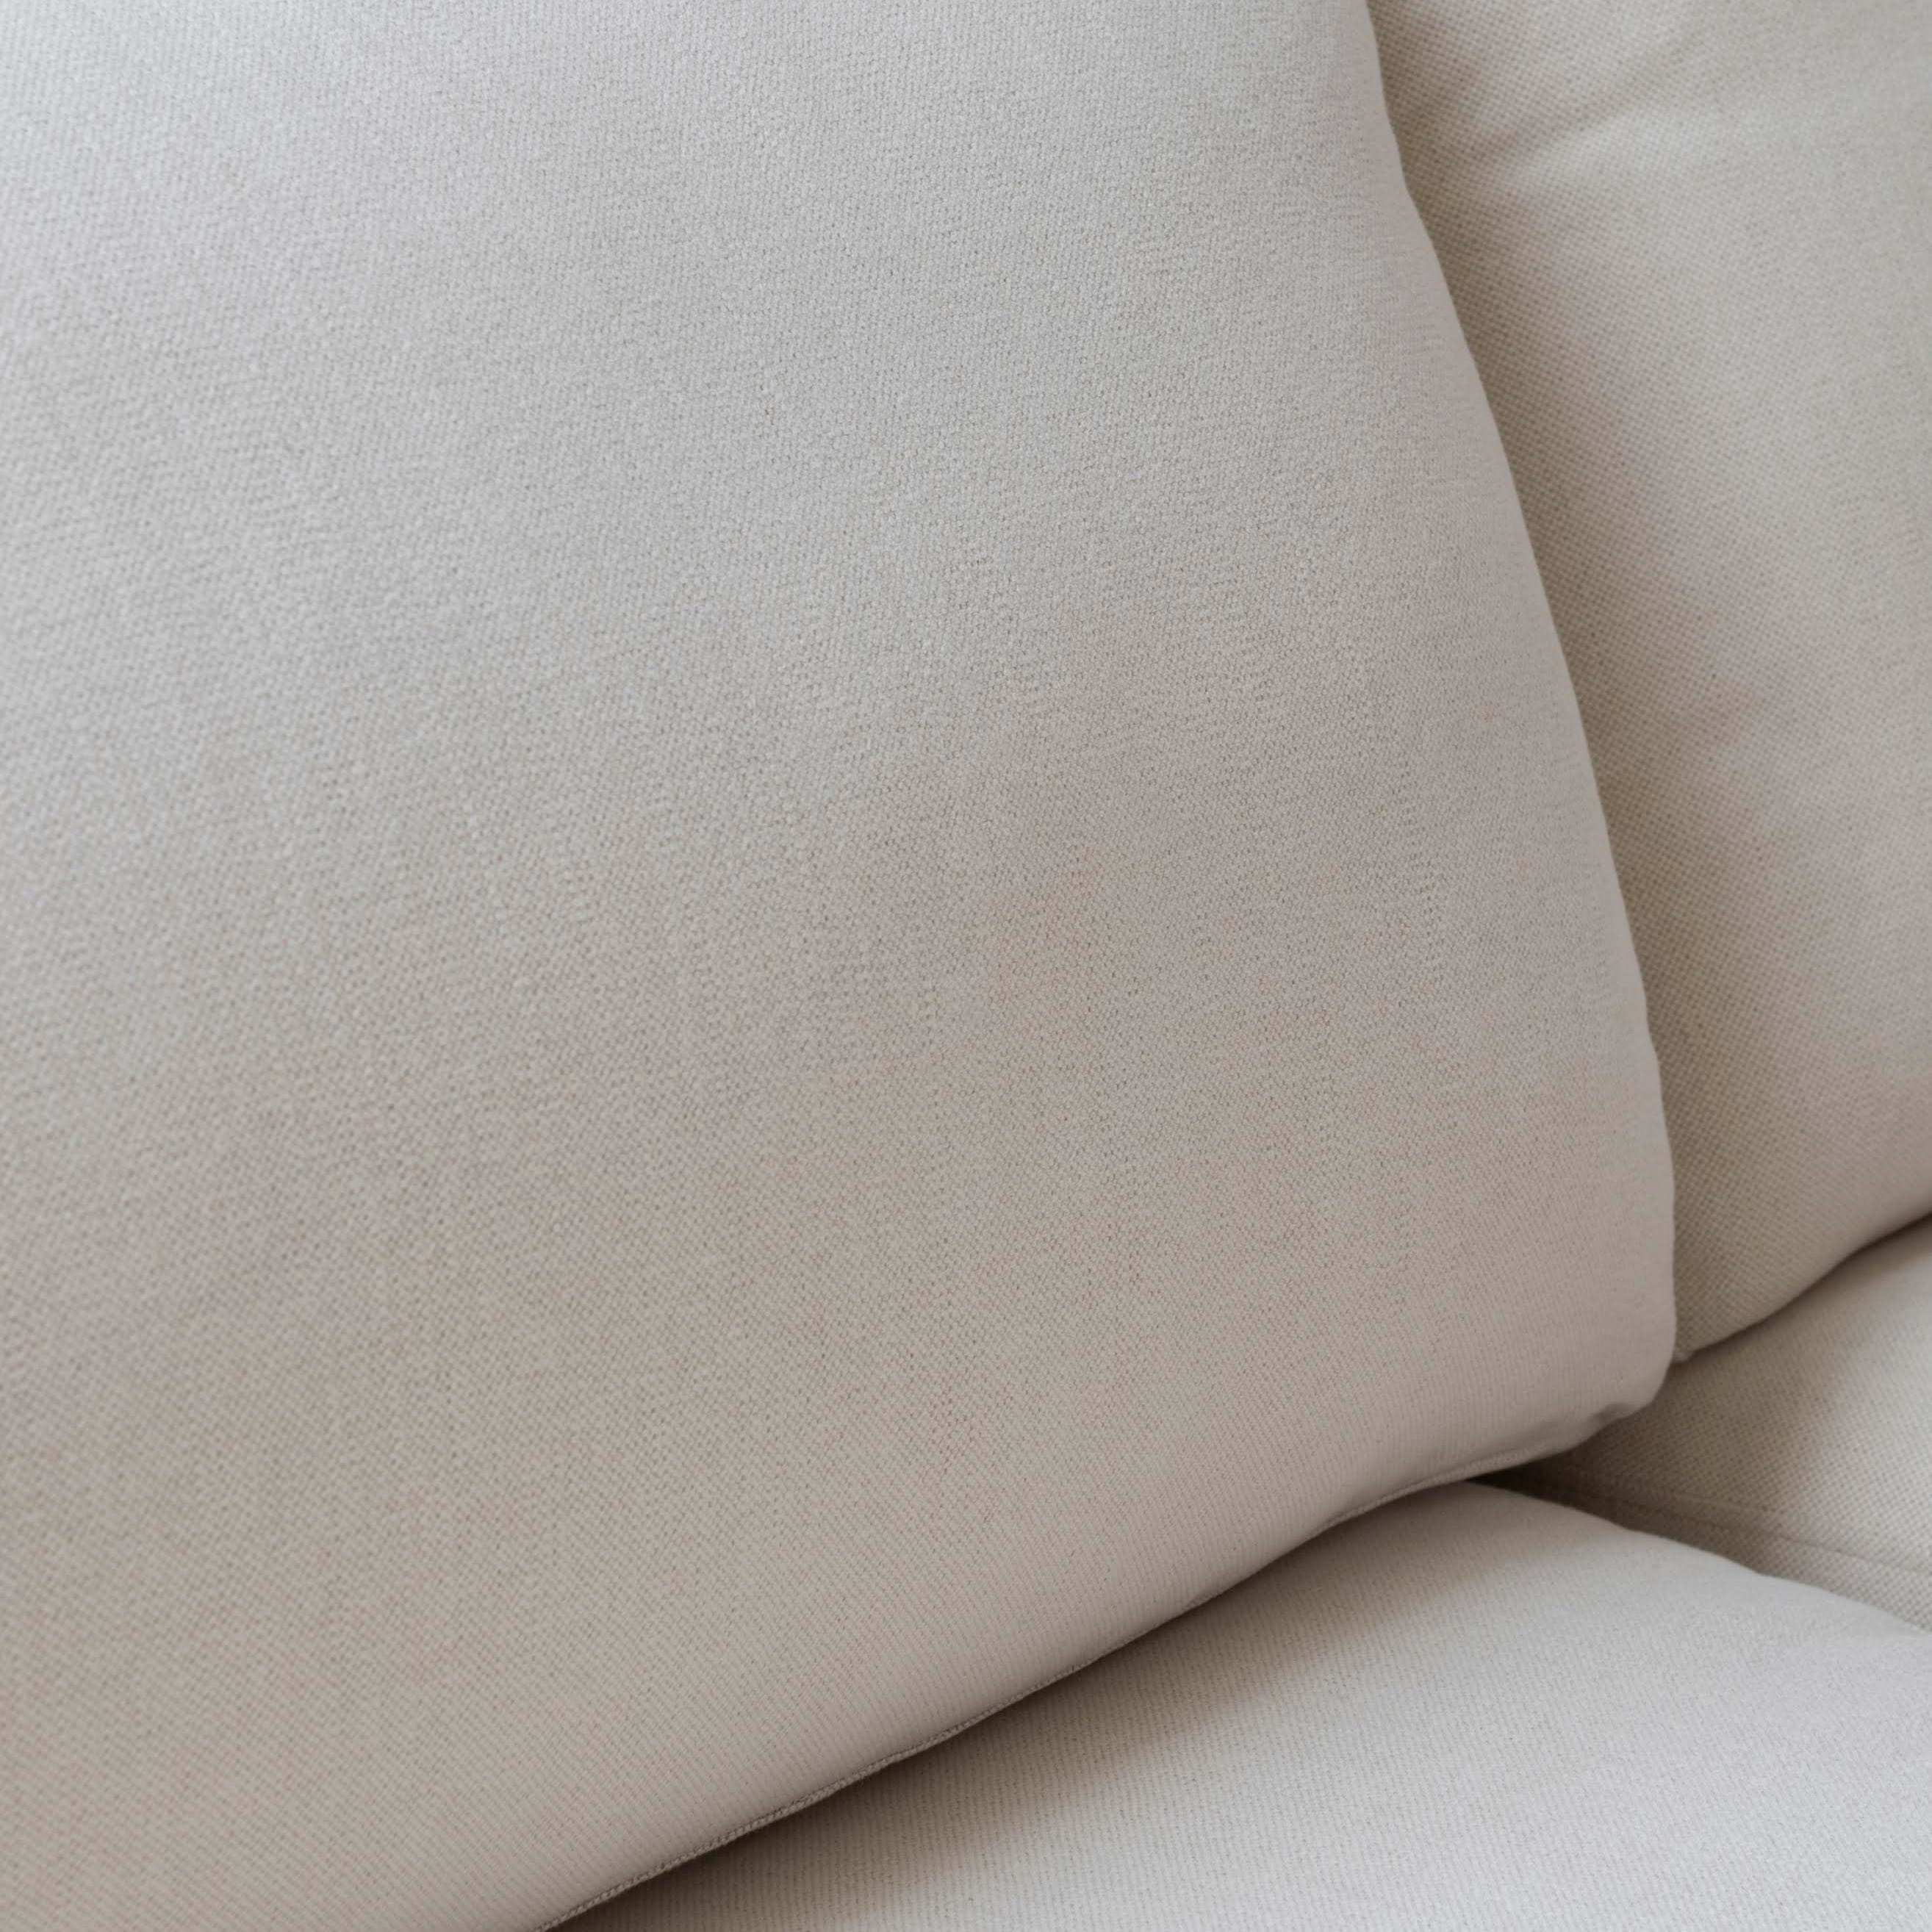 ikea Soderhamn Peach Panama Cotton bemz.jpg | Scandinavian